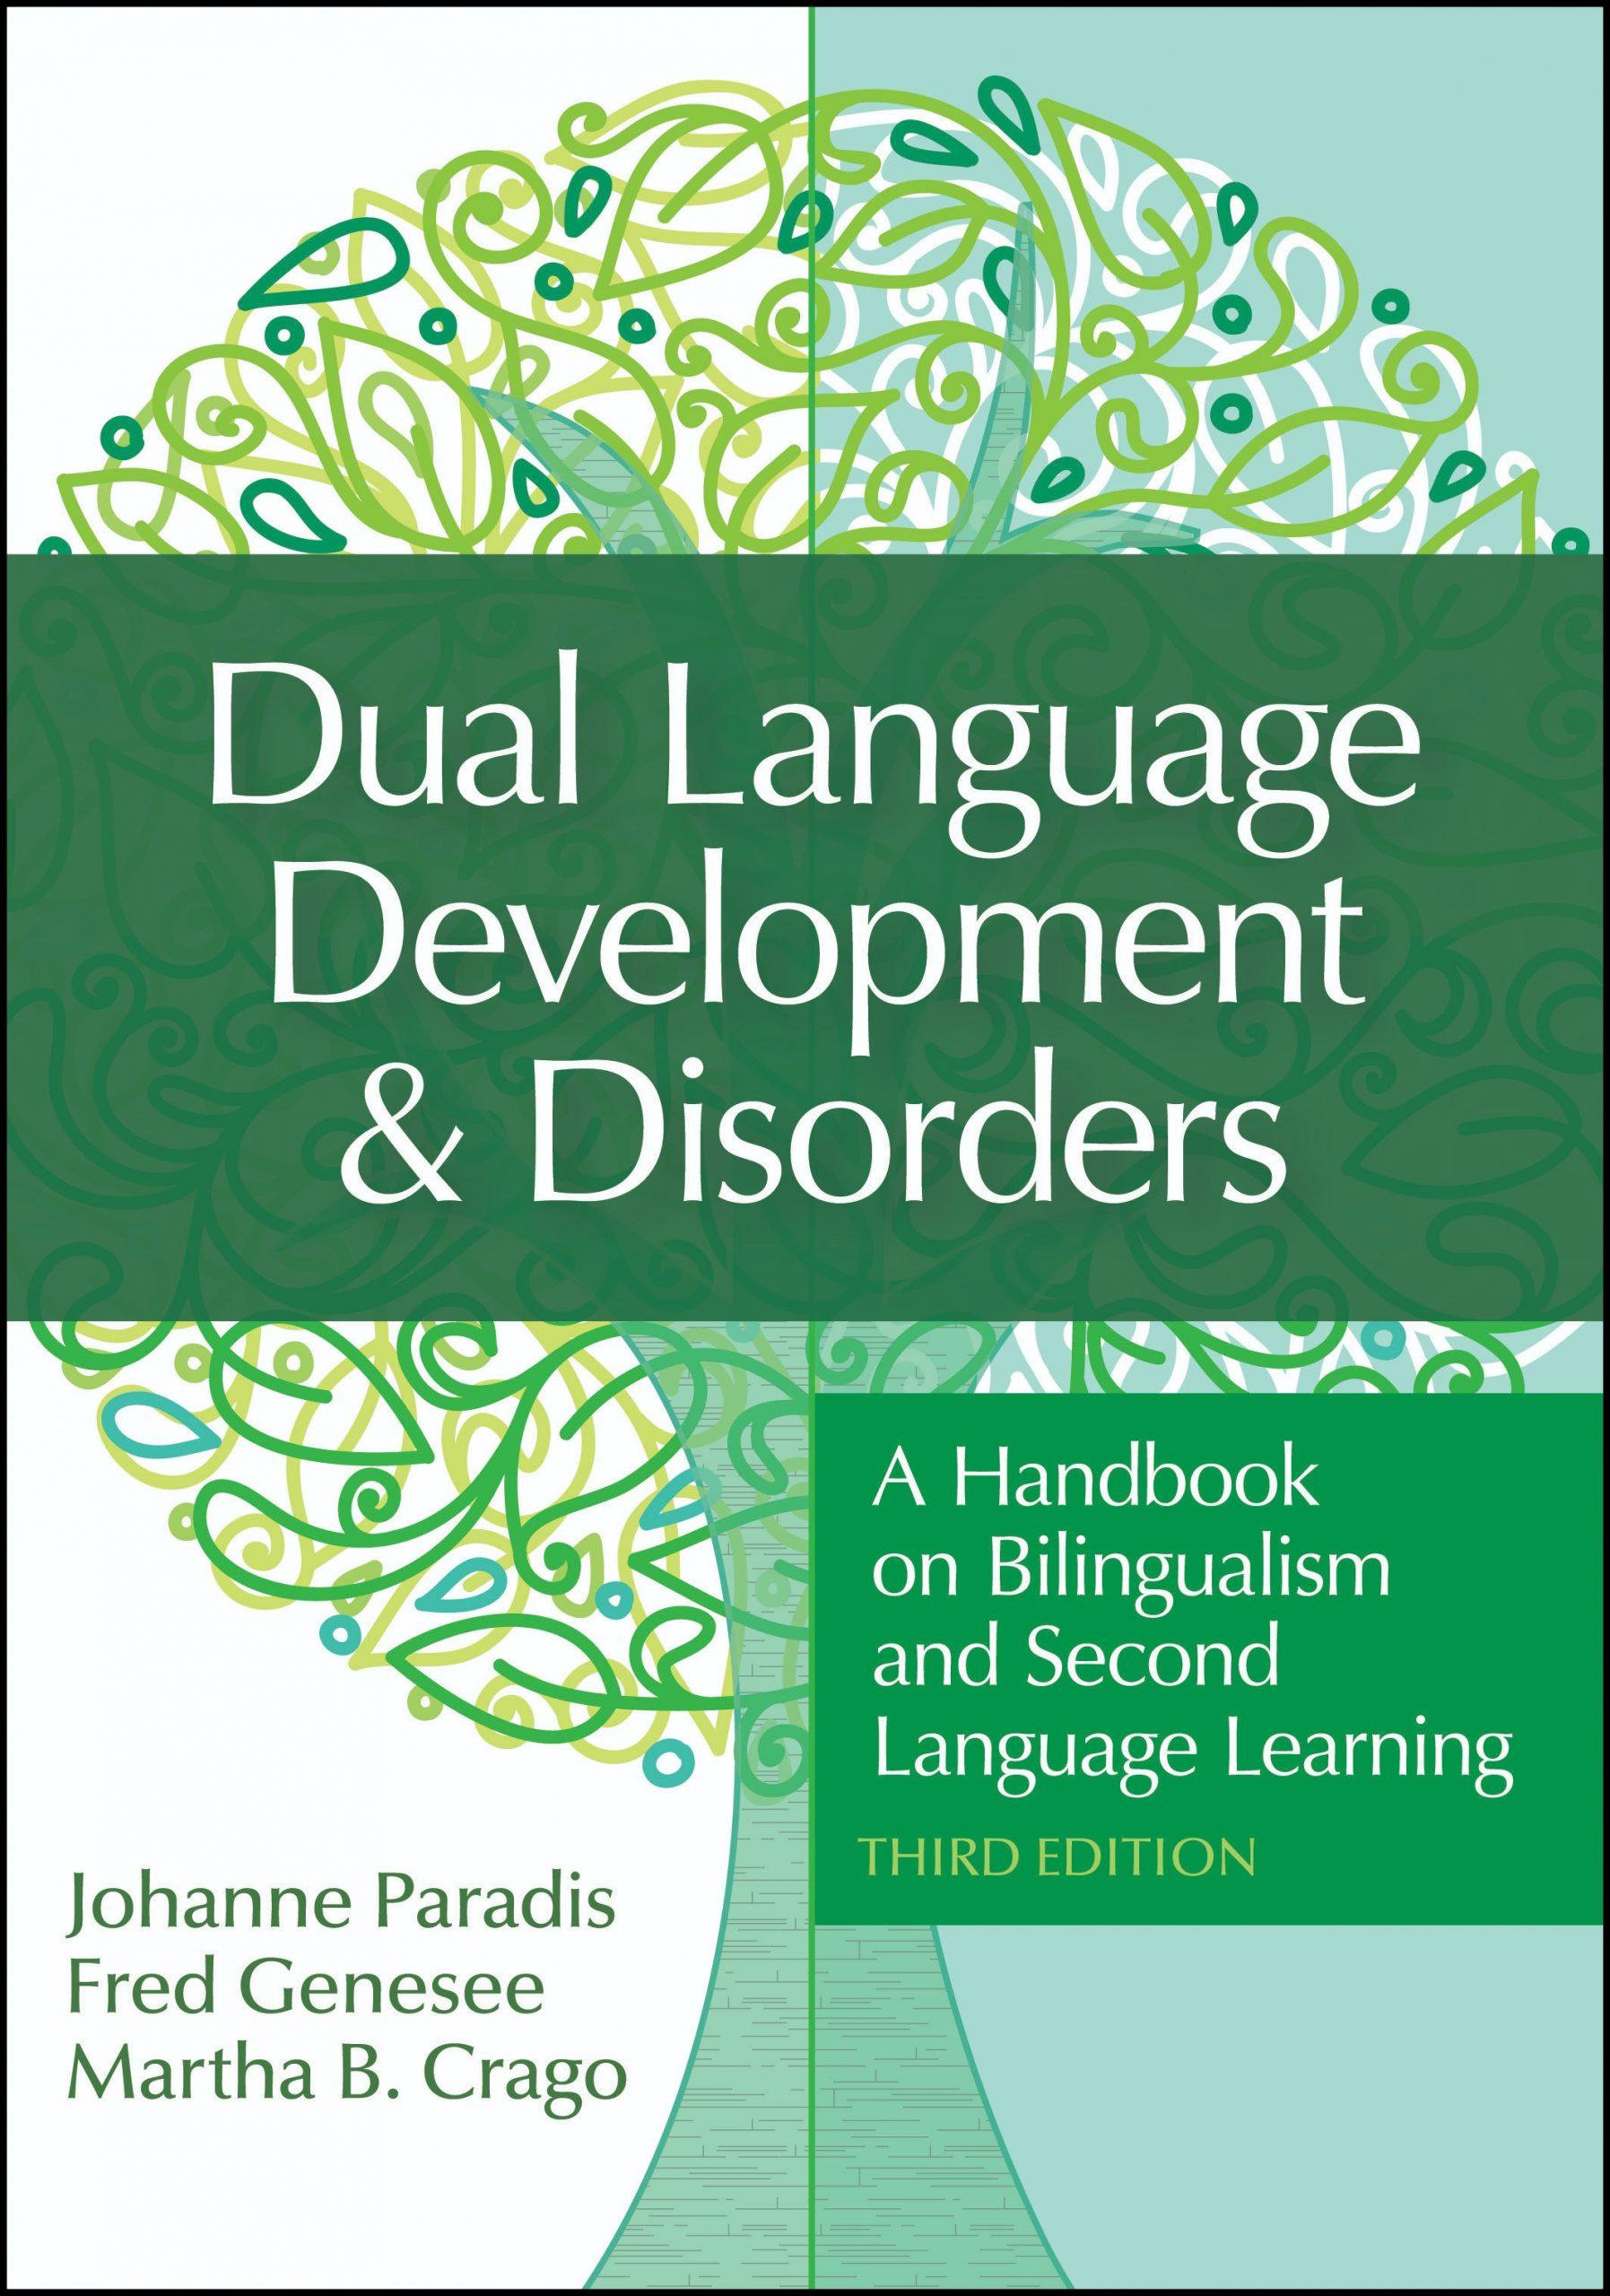 Dual Language Development & Disorders